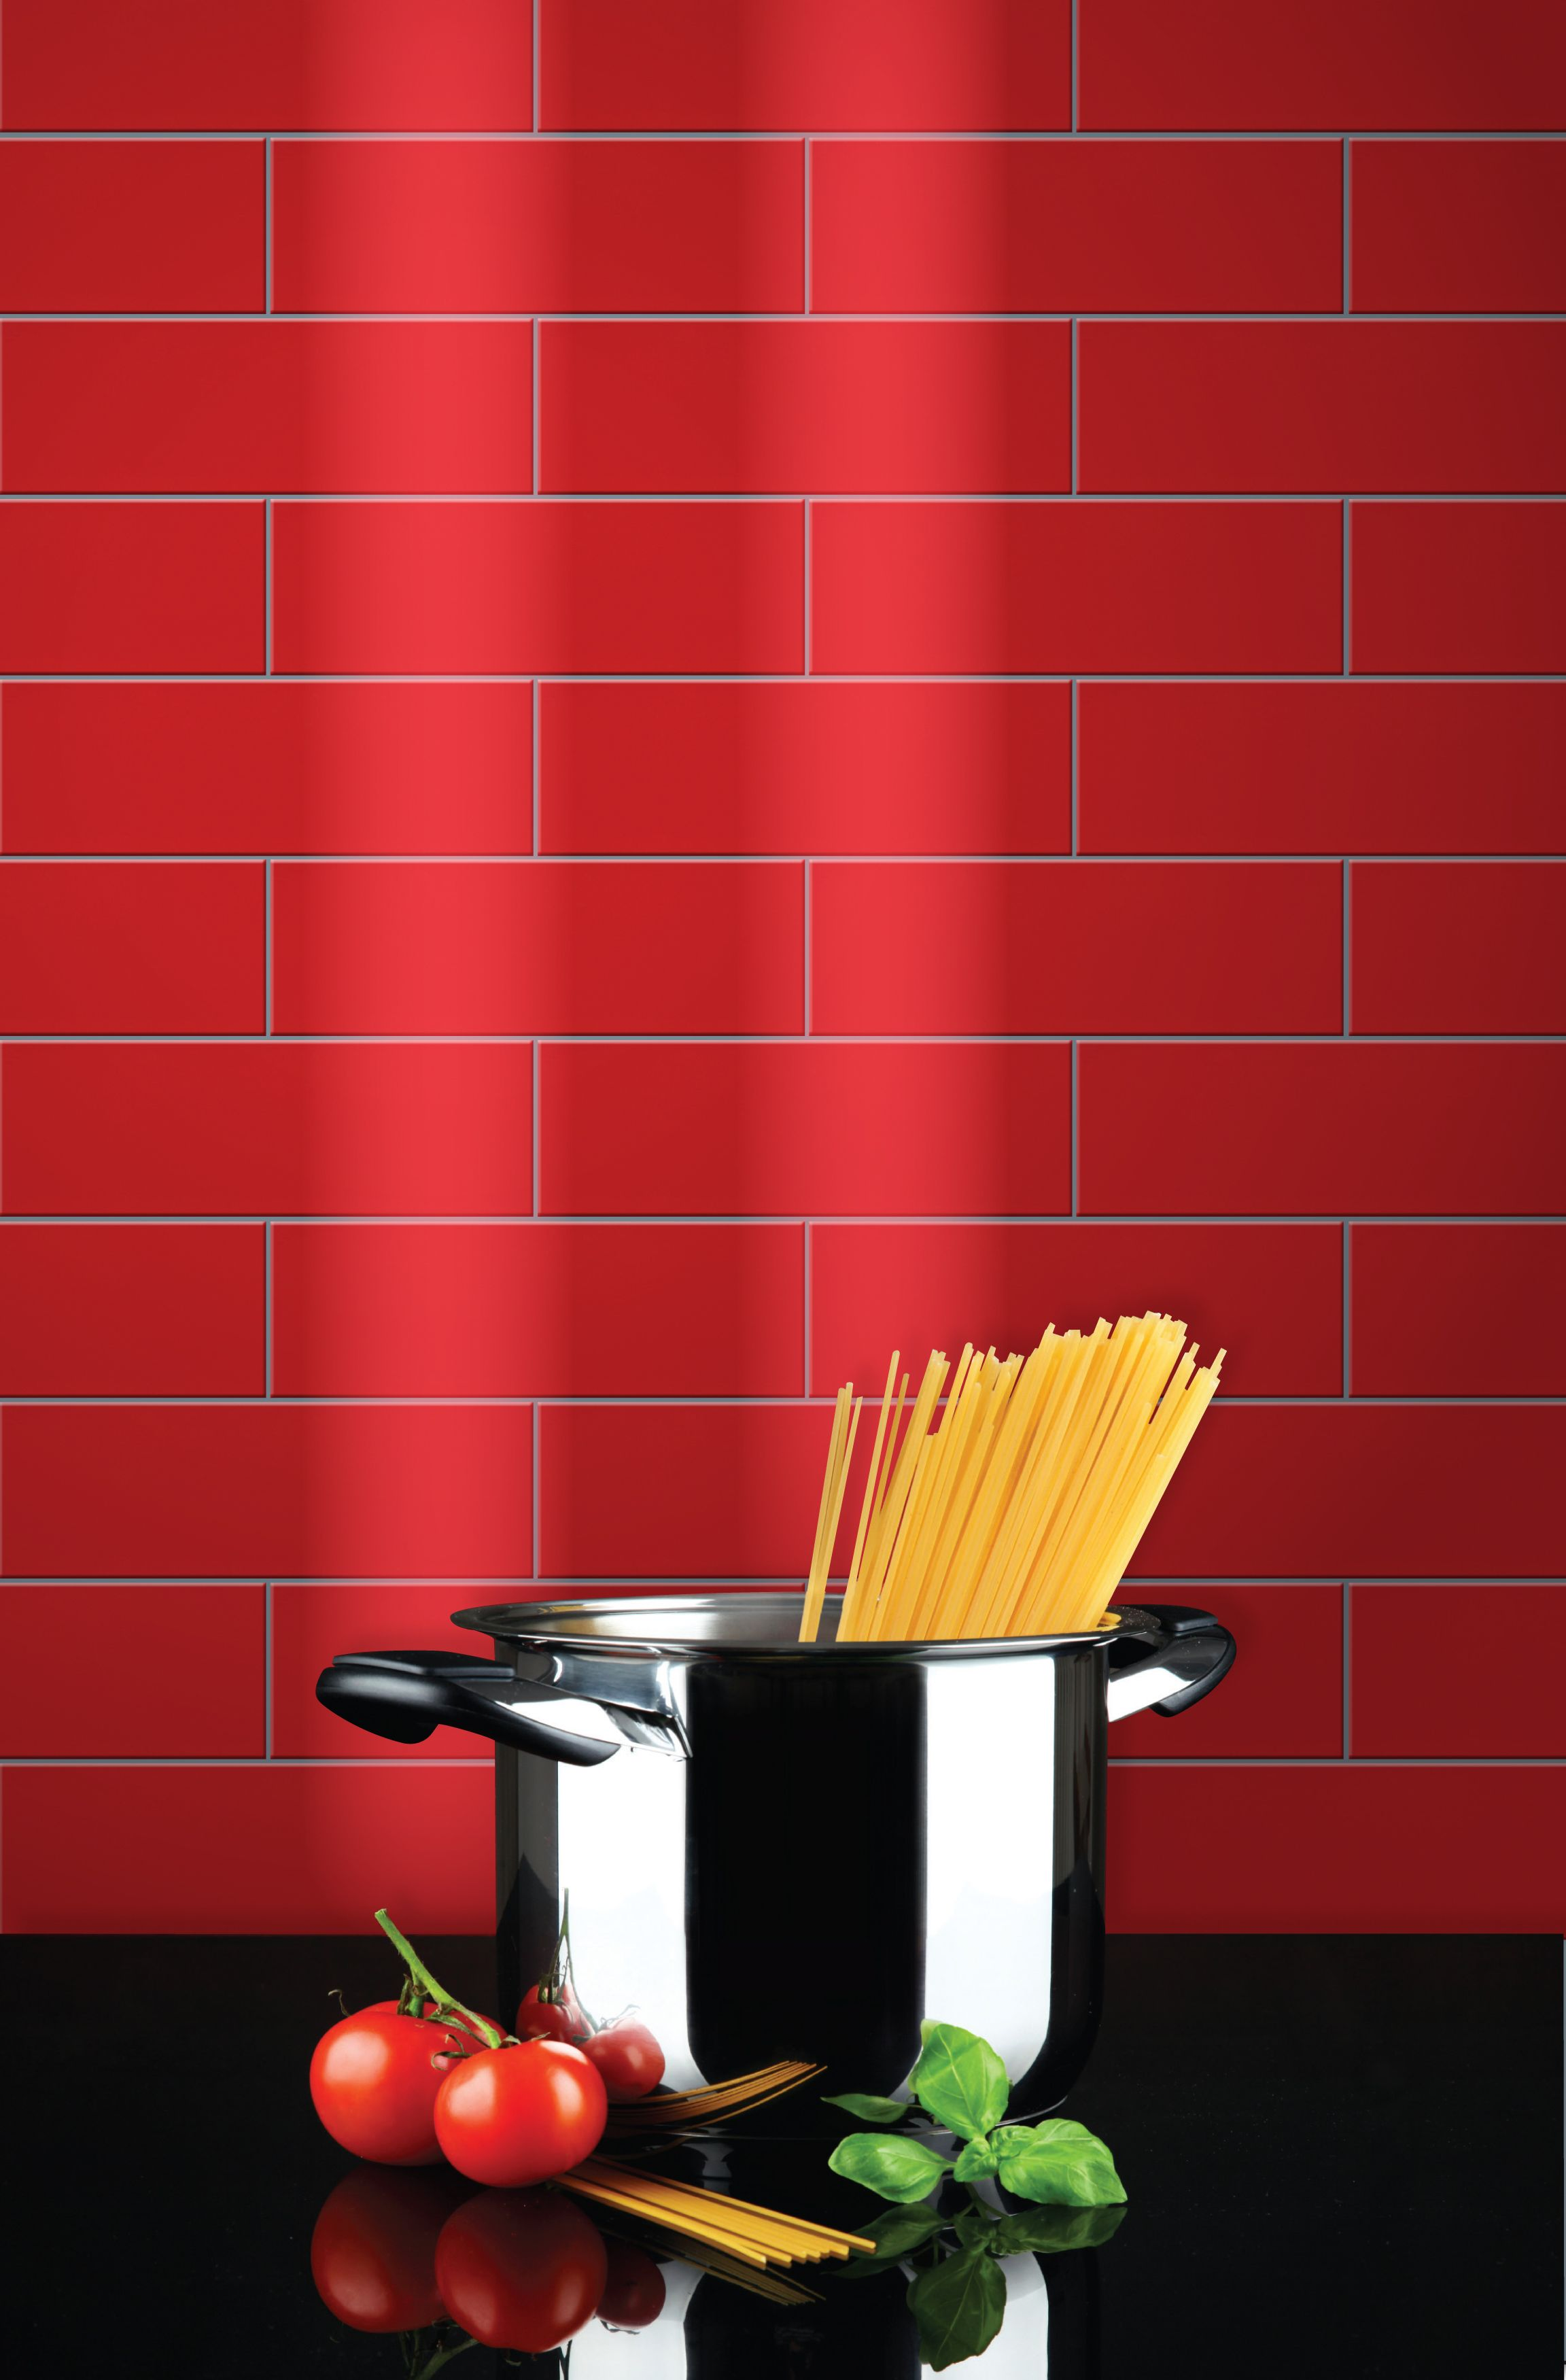 Glass Tiles Are An Effective Splashback Heat Resistant To 600 Degrees Celcius Johnson Tiles Glass Tile Kitchen Tiles